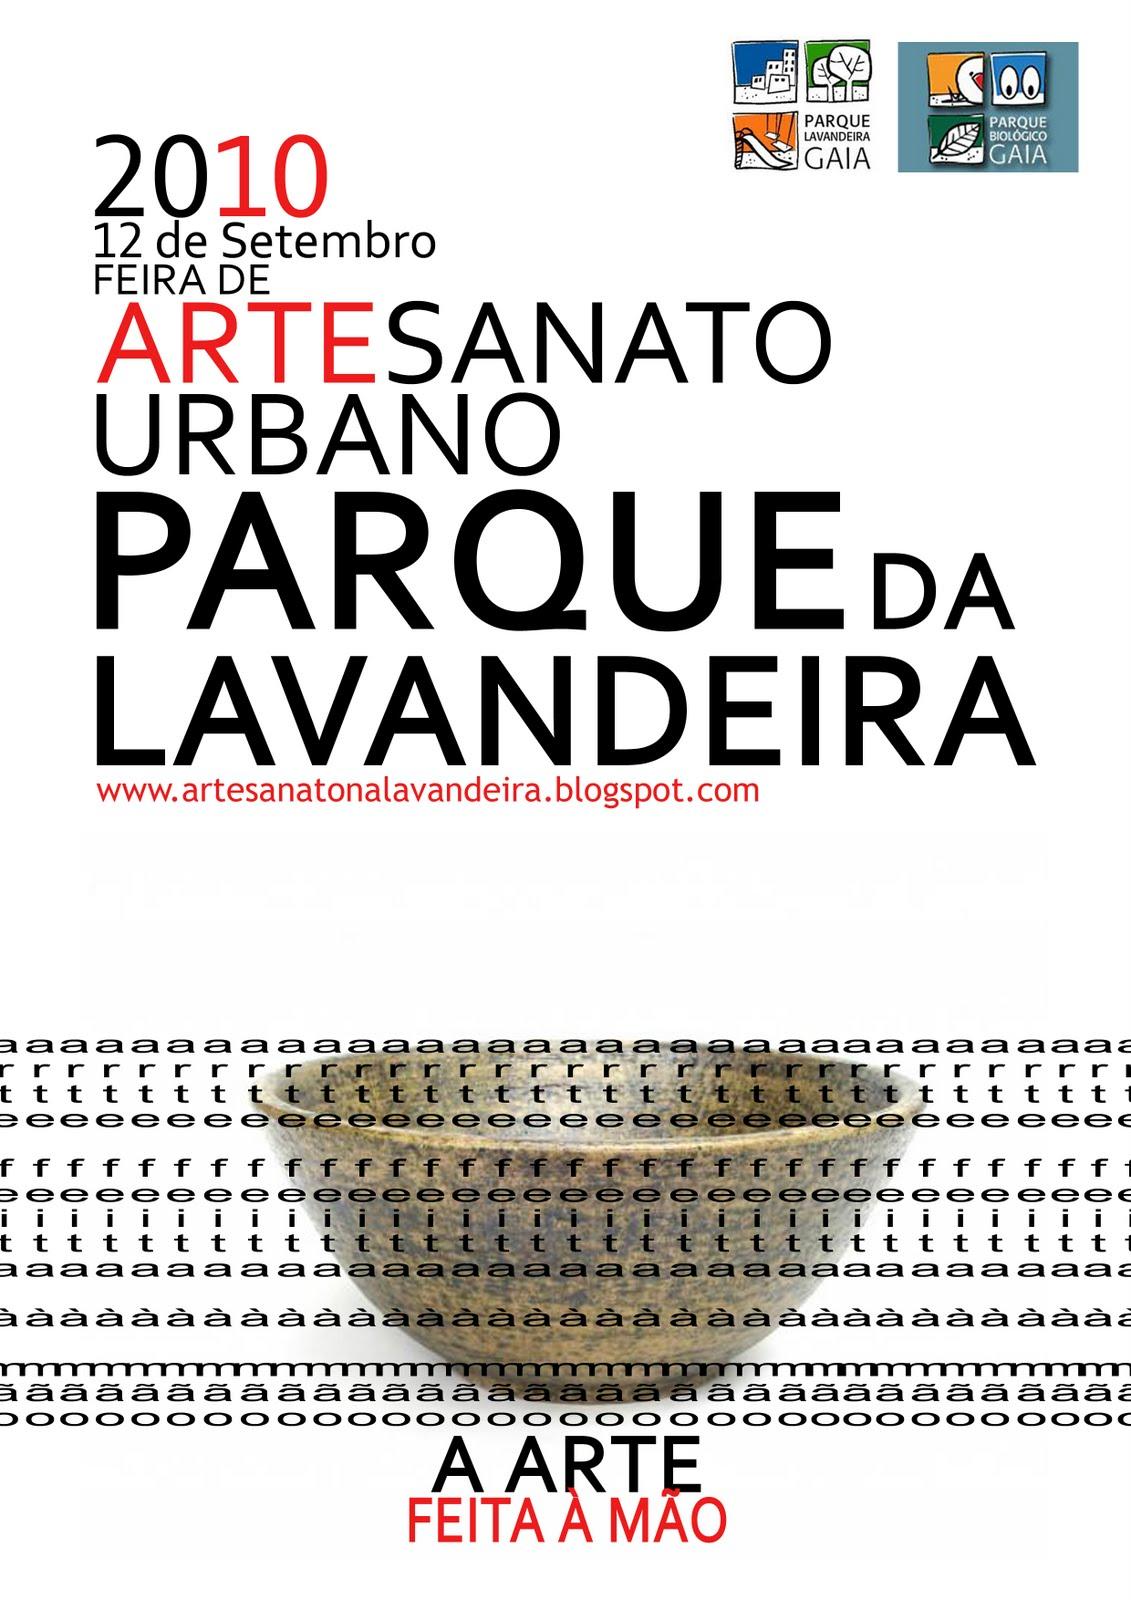 Adesivo De Parede Na Zona Leste ~ Laura Handcraft Artesanato Infantil e Urbano Artesanato Urbano no Parque da Lavandeira